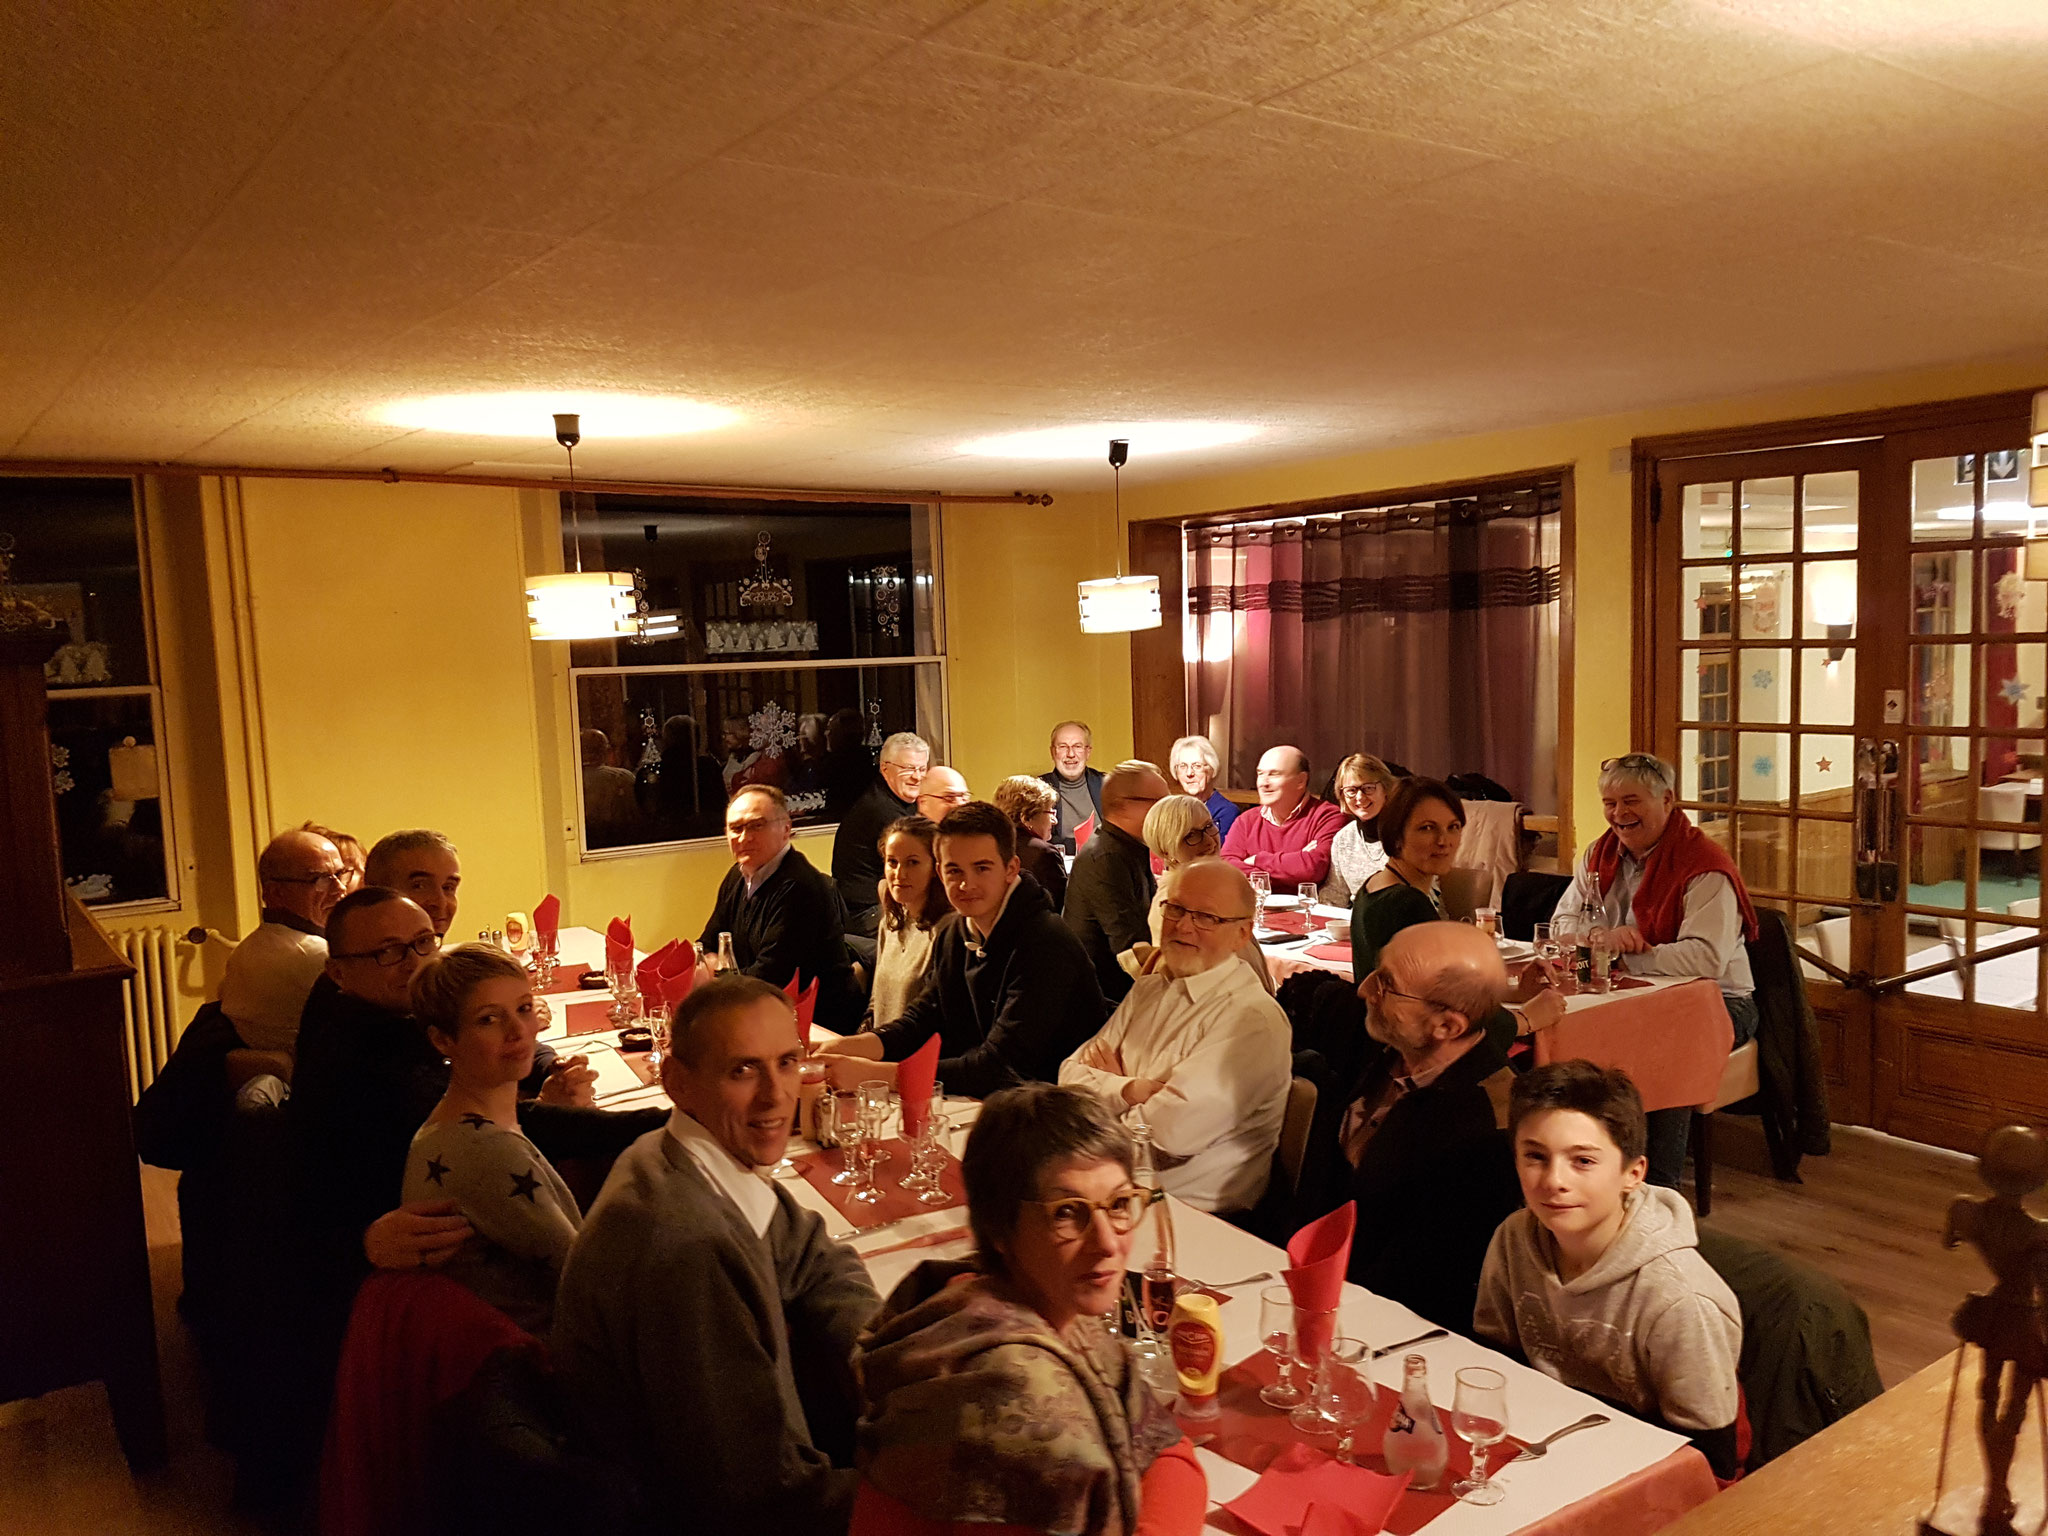 Aéro-Club de Sens - Galette 2019 - Membres - Dîner 2